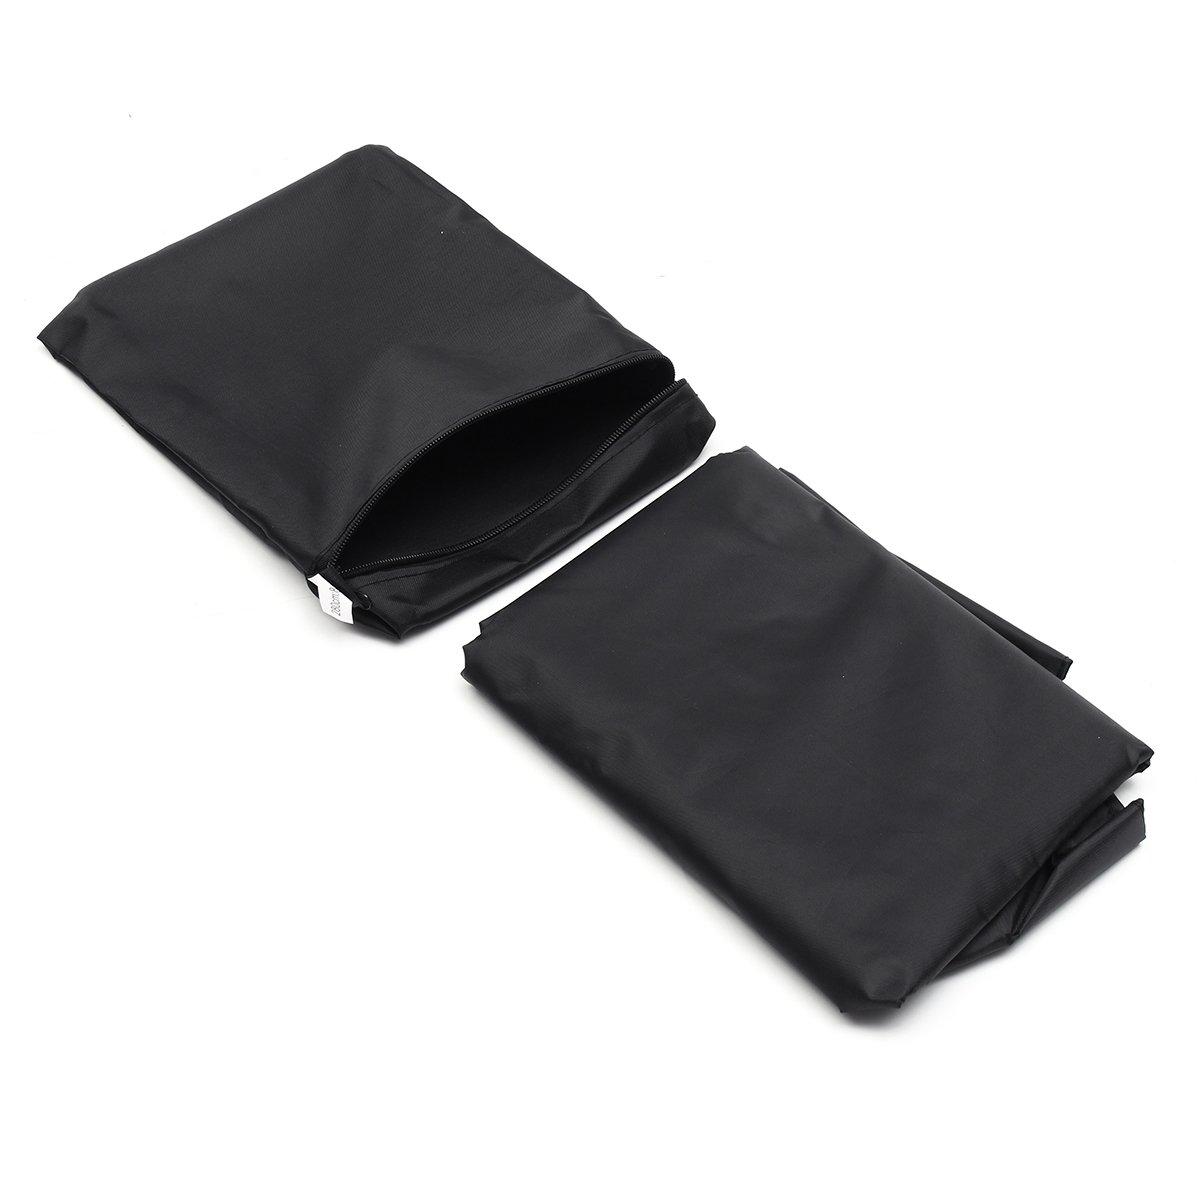 18'' X 32'' X 12'' X 110'' Parasol Umbrella Cover Black Oxford Polyester Rectangular Waterproof Durable  Outdoor Patio Garden Furniture Protection Protective Cloth Covering